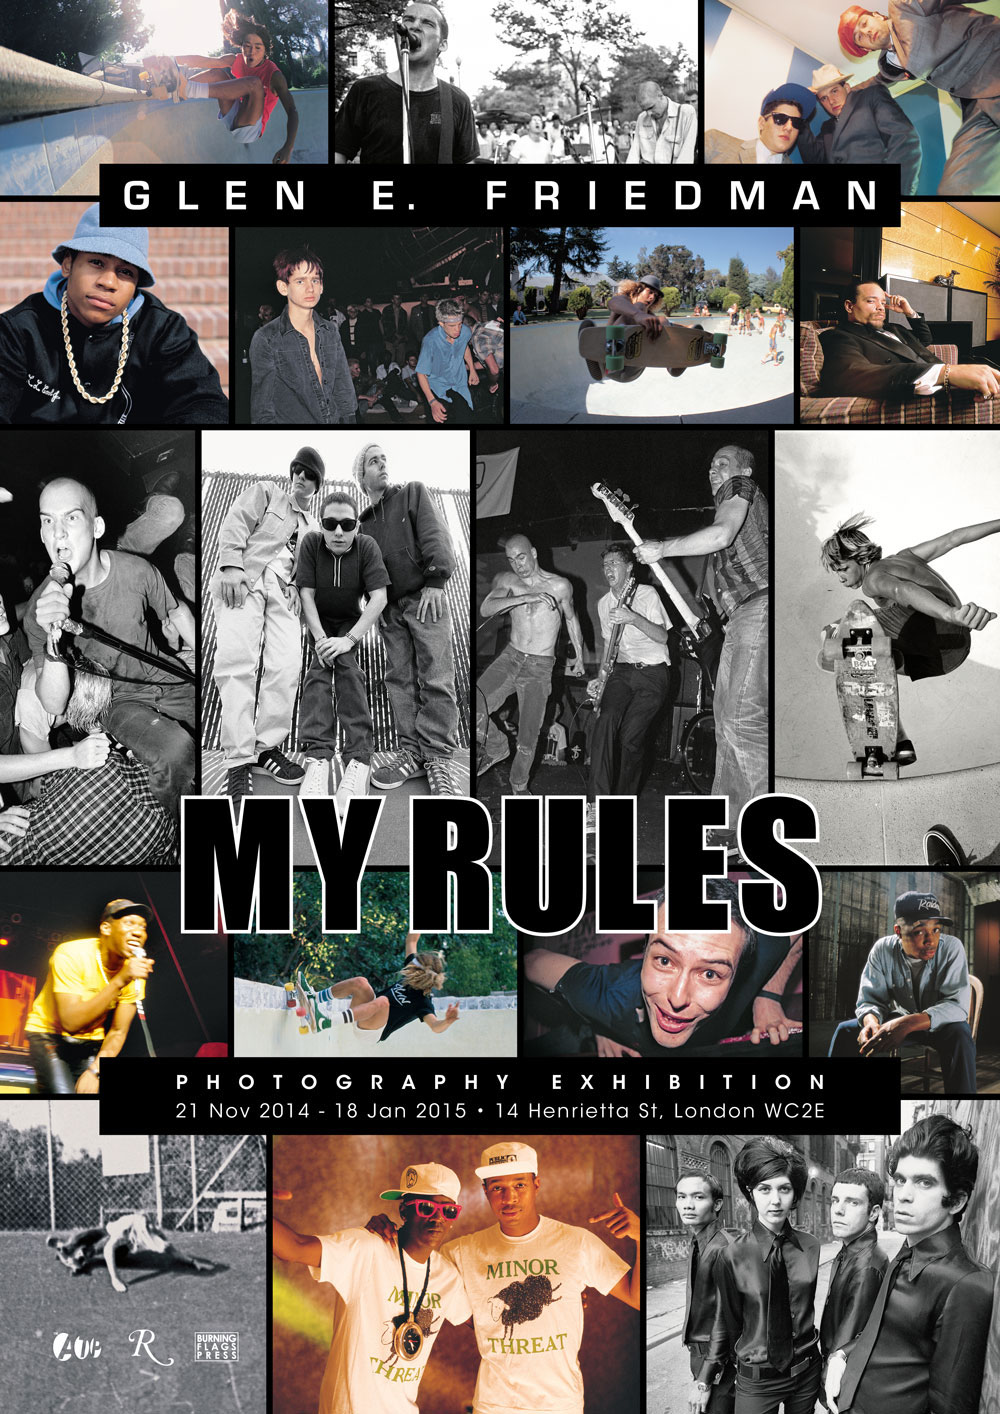 Adobe Portfolio music skateboarding Photography  Exhibition Design  cult Tony Hawk run dmc public enemy graphic design